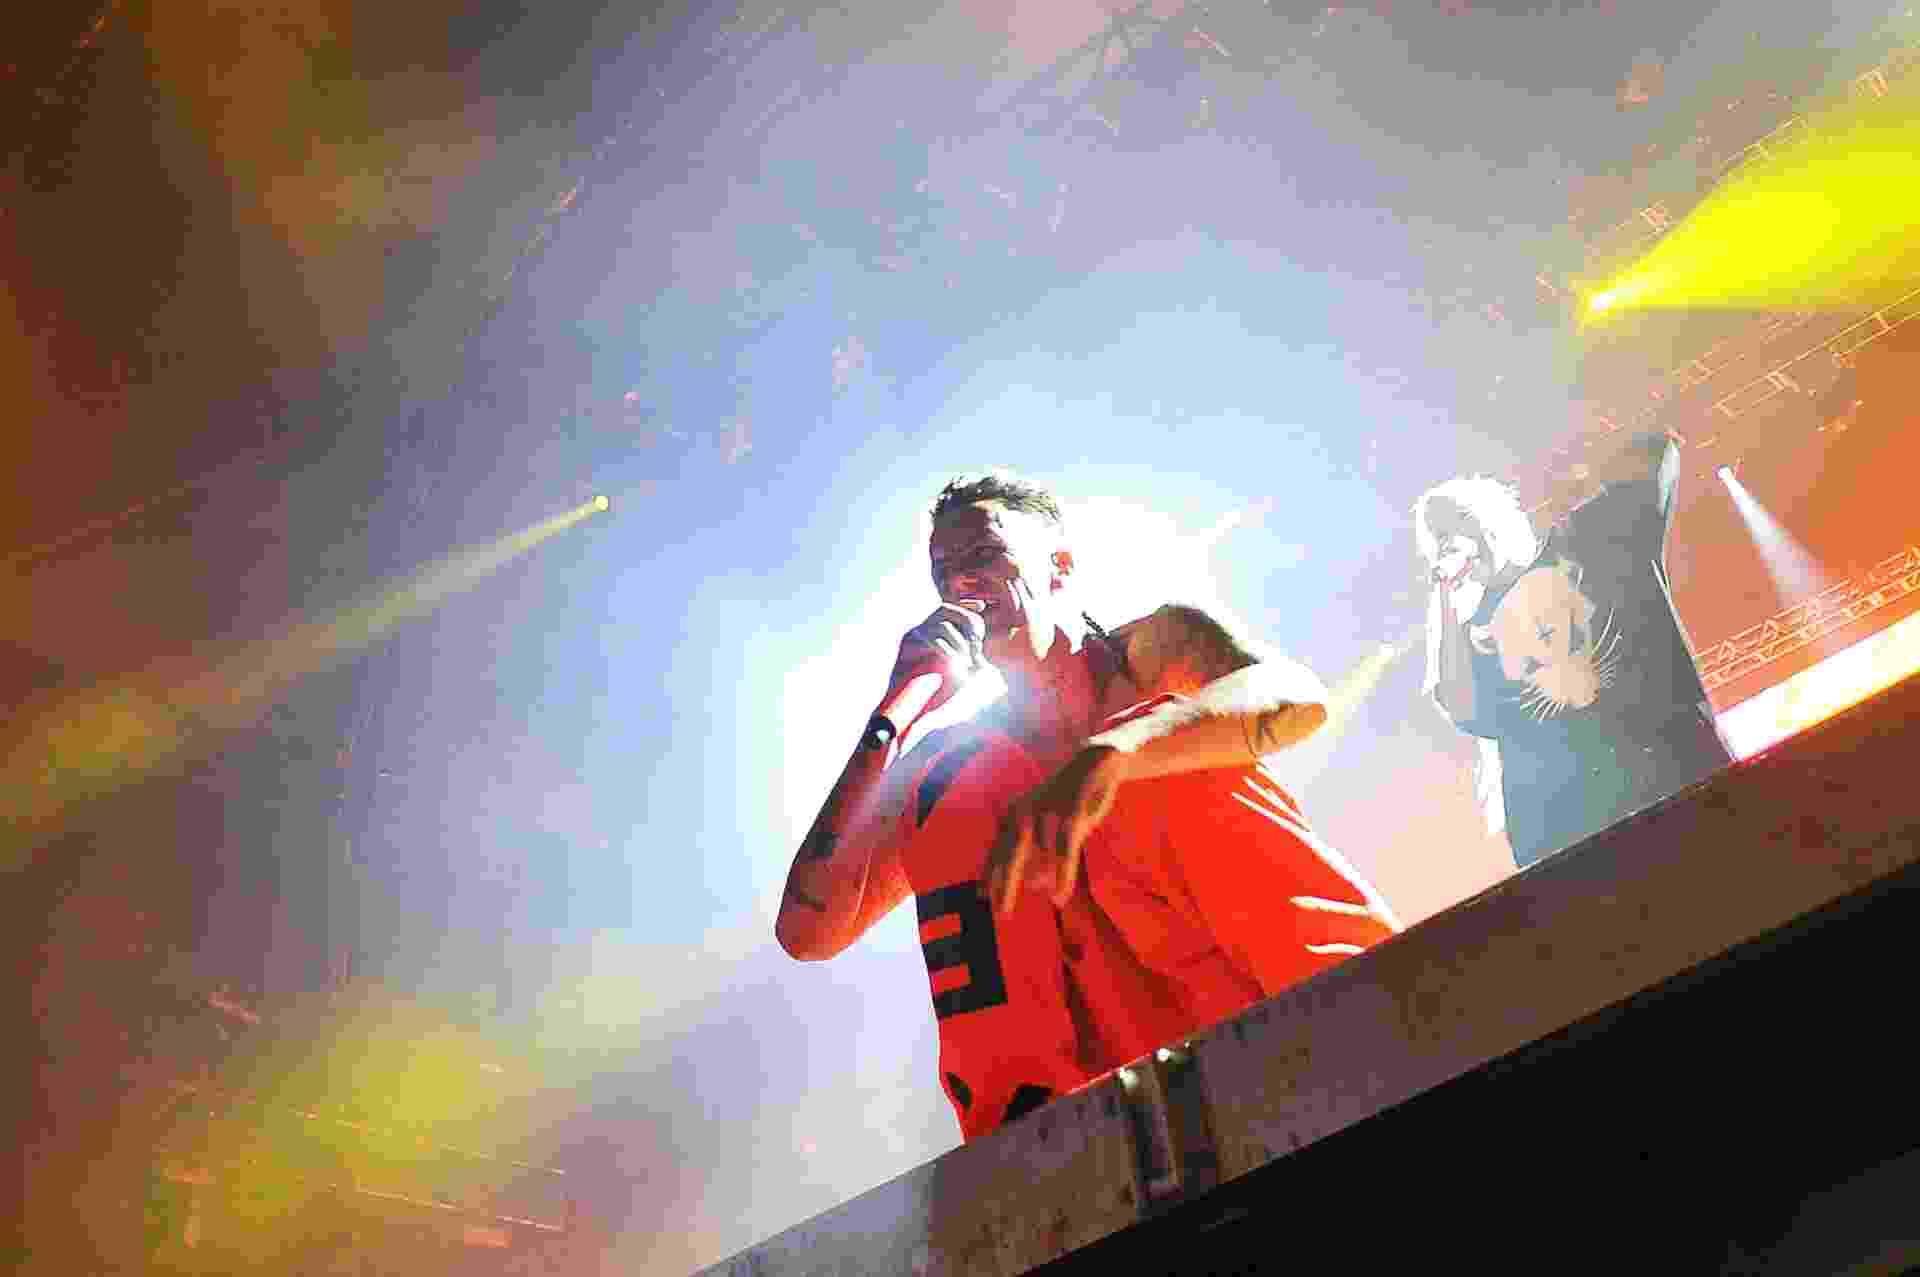 12.mar.2016 - Os sul-africanos do Die Antwoord se apresentam no Lollapalooza Brasil 2016 - Reinaldo Canato/UOL